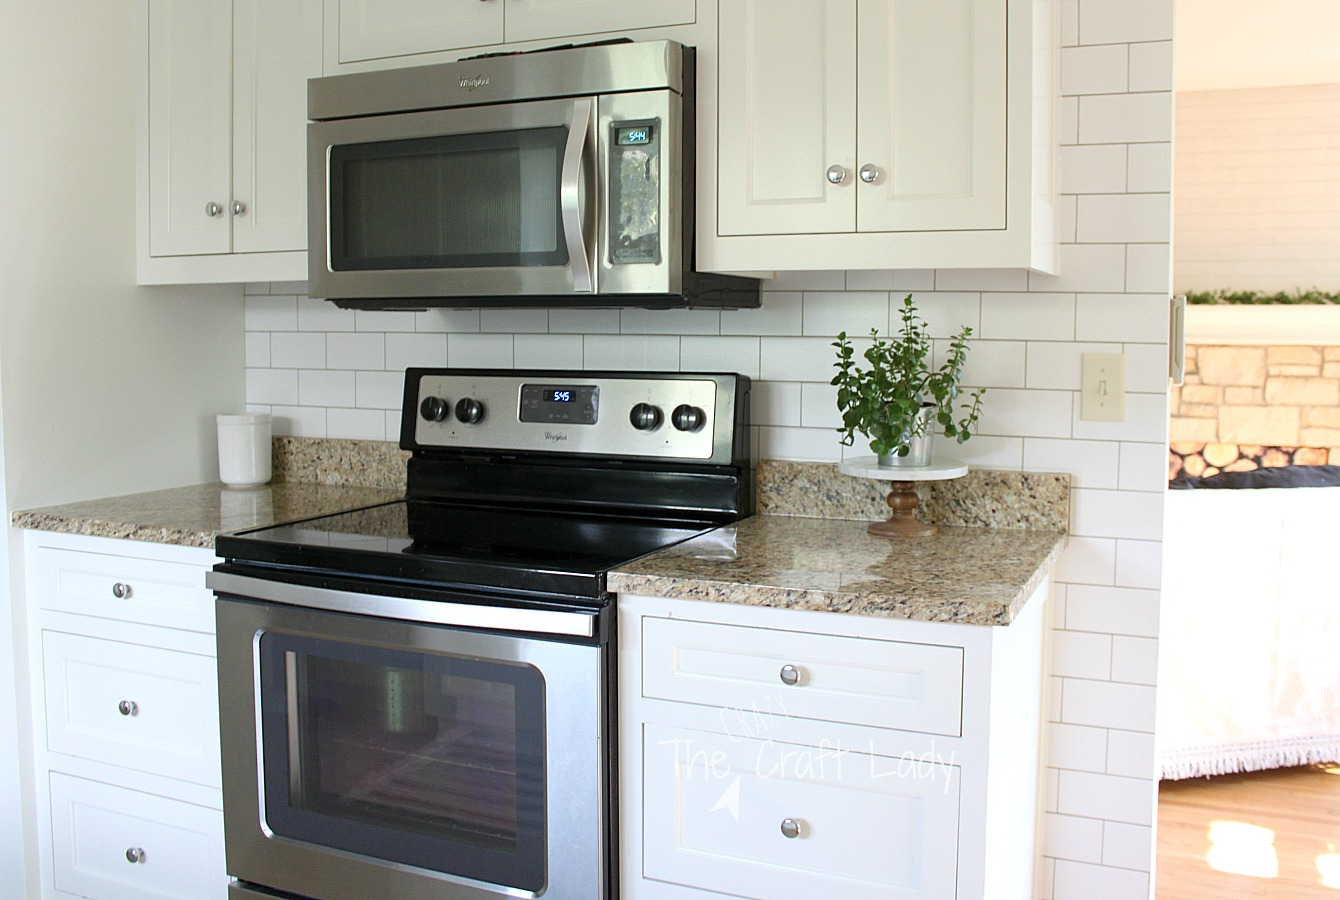 wallpaper kitchen backsplash forged knives white subway tile temporary the full tutorial